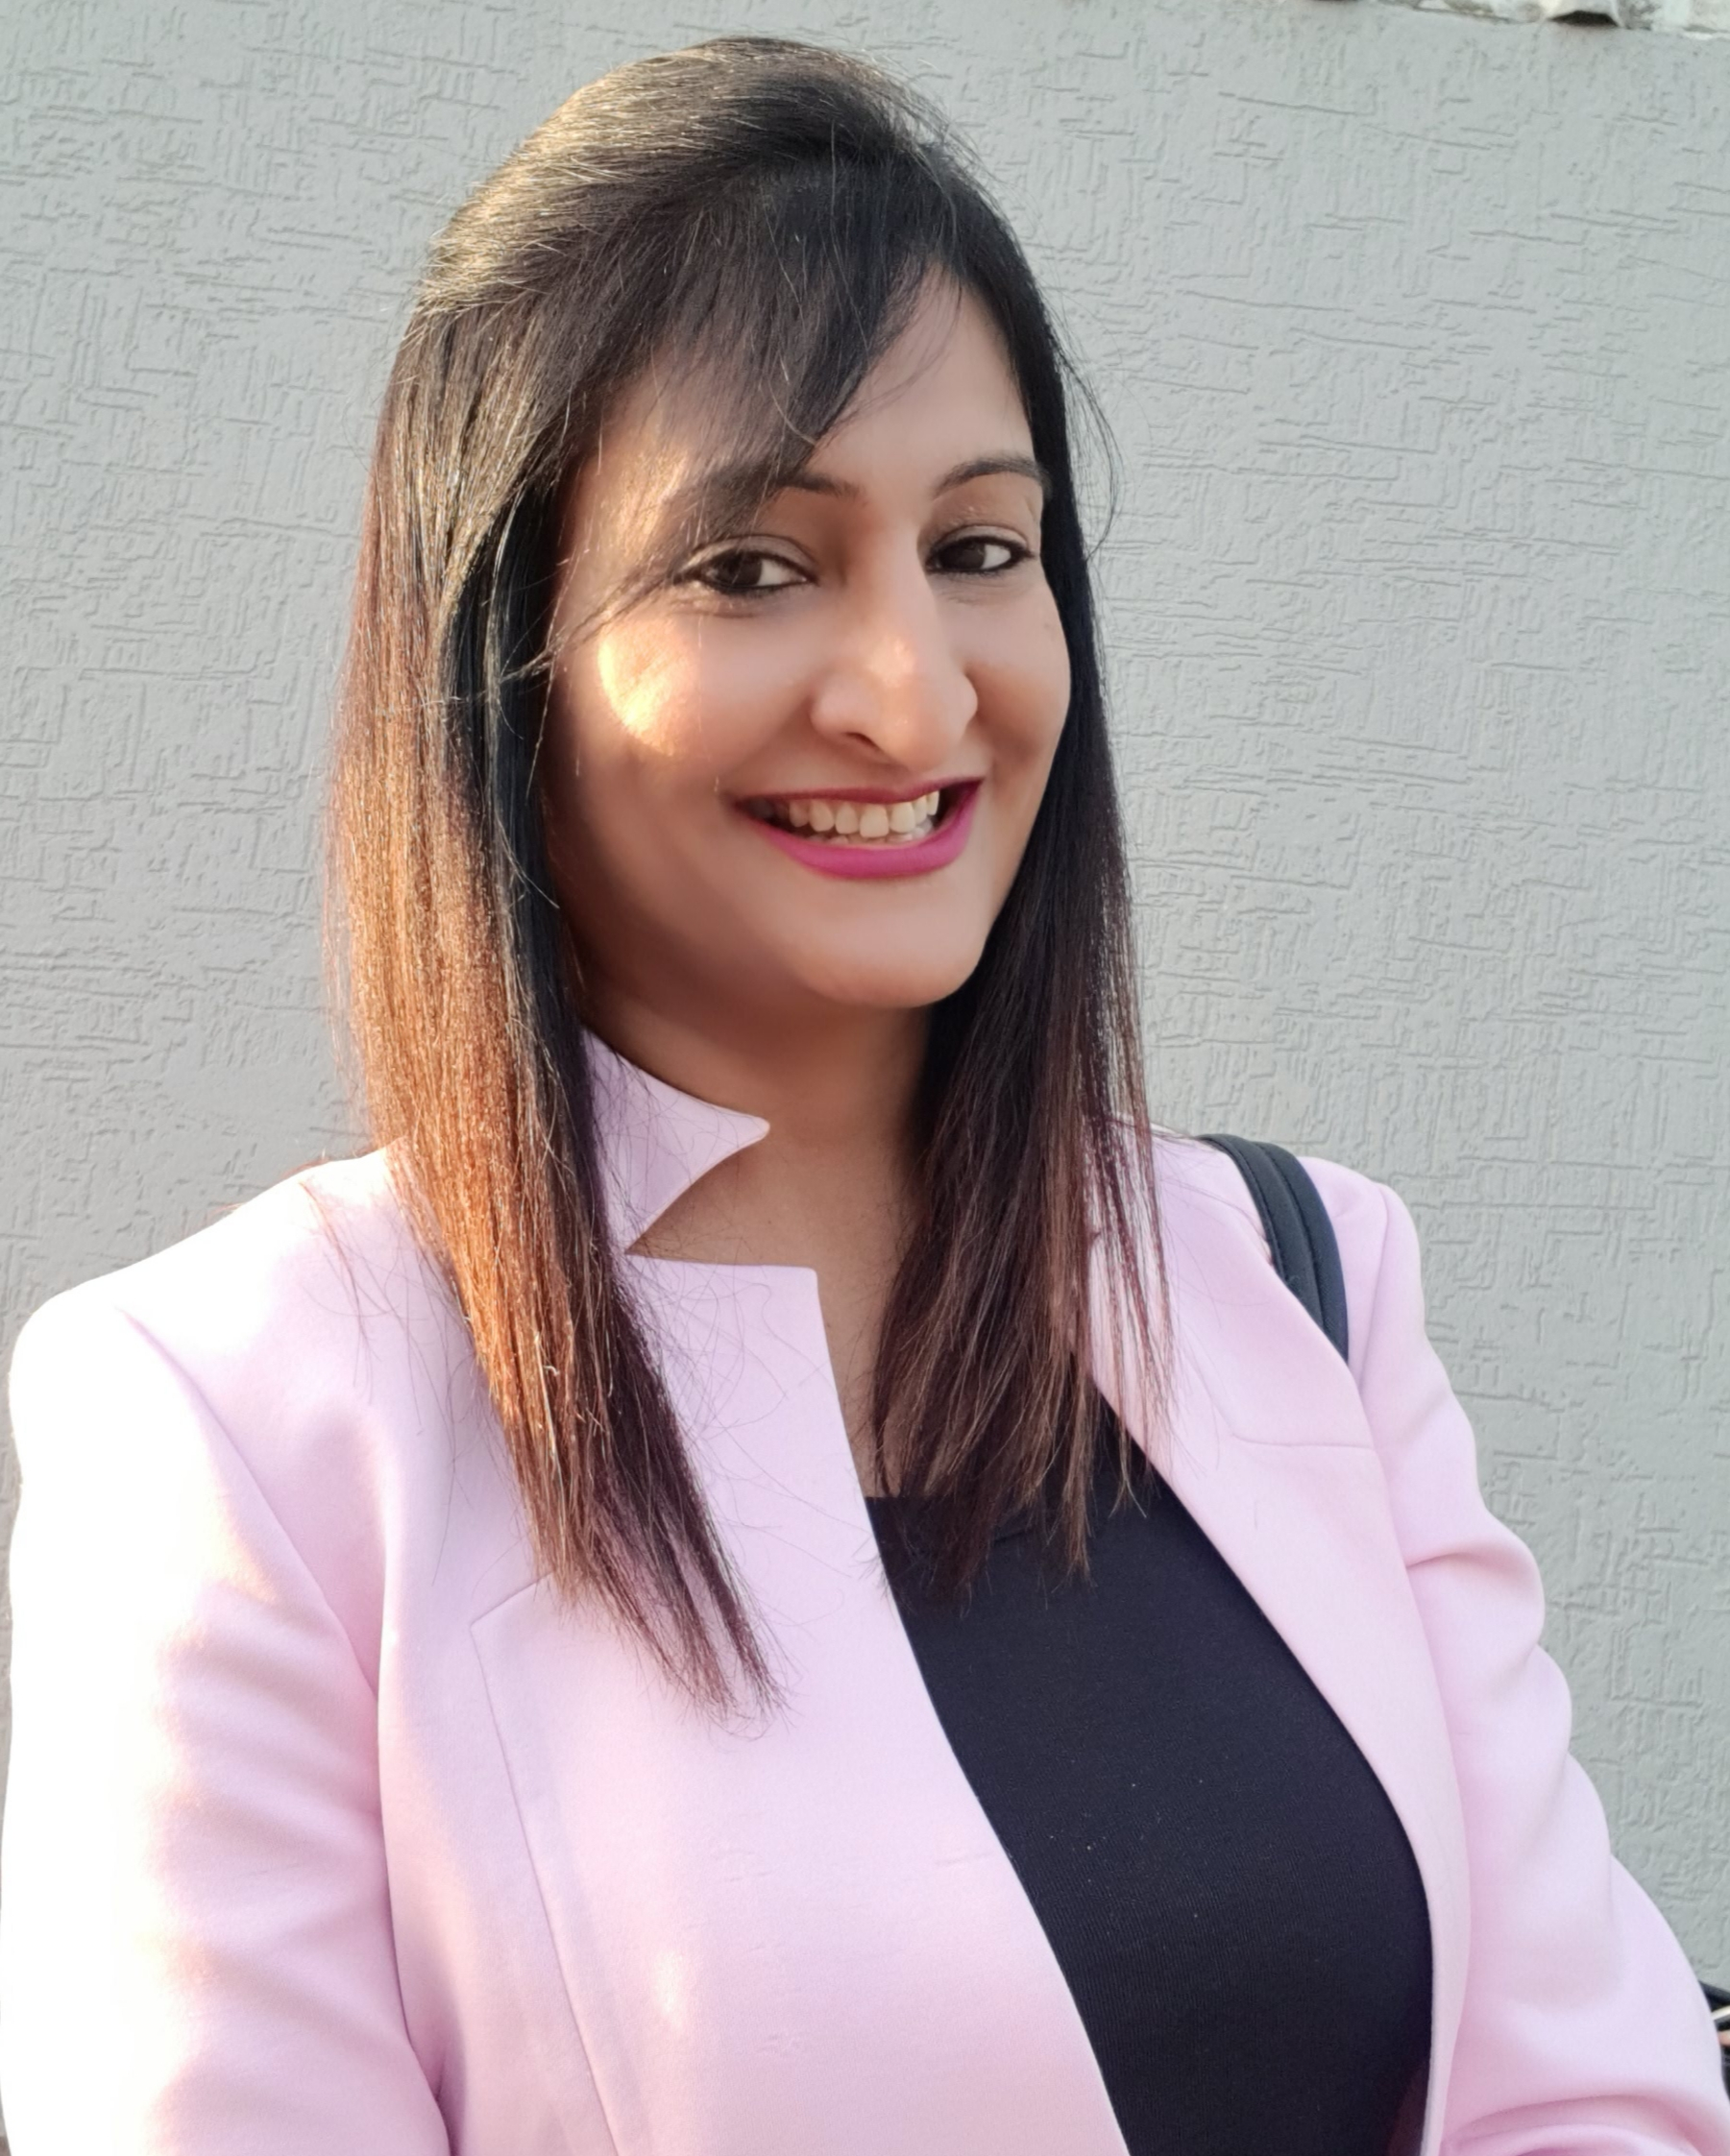 Sunita Nandwani